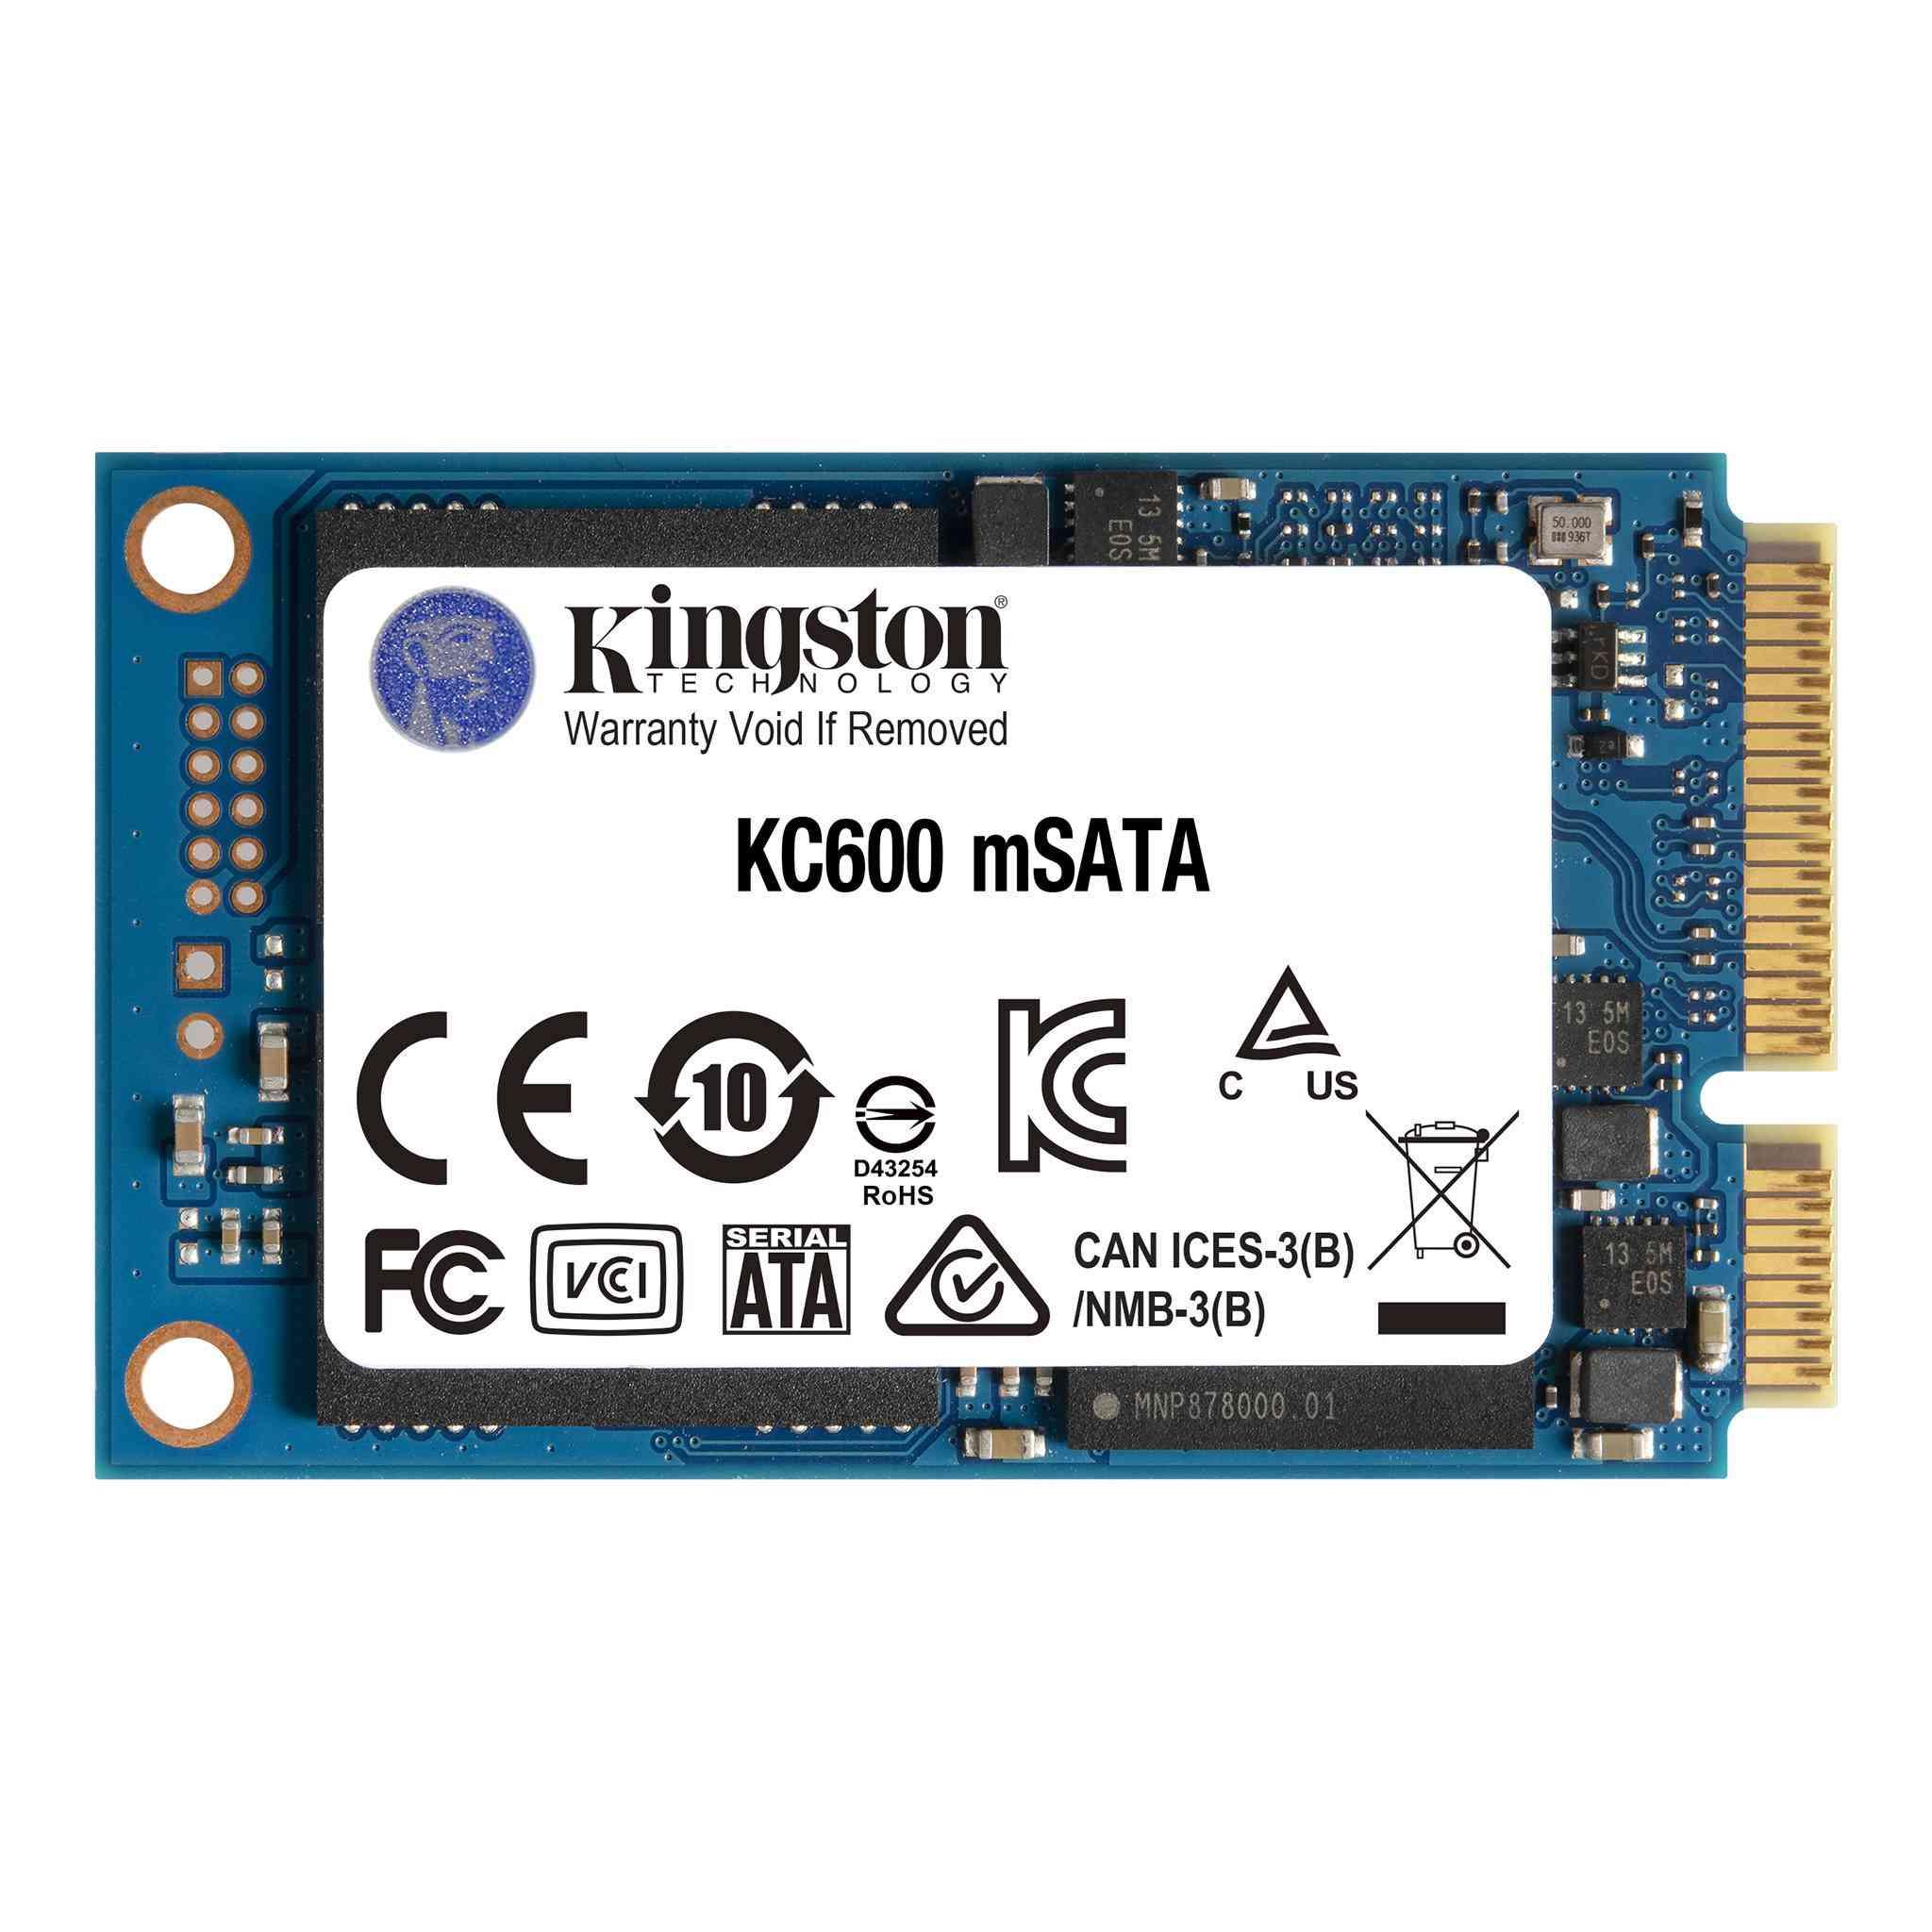 Kingston mSATA KC600 Module – 512GB